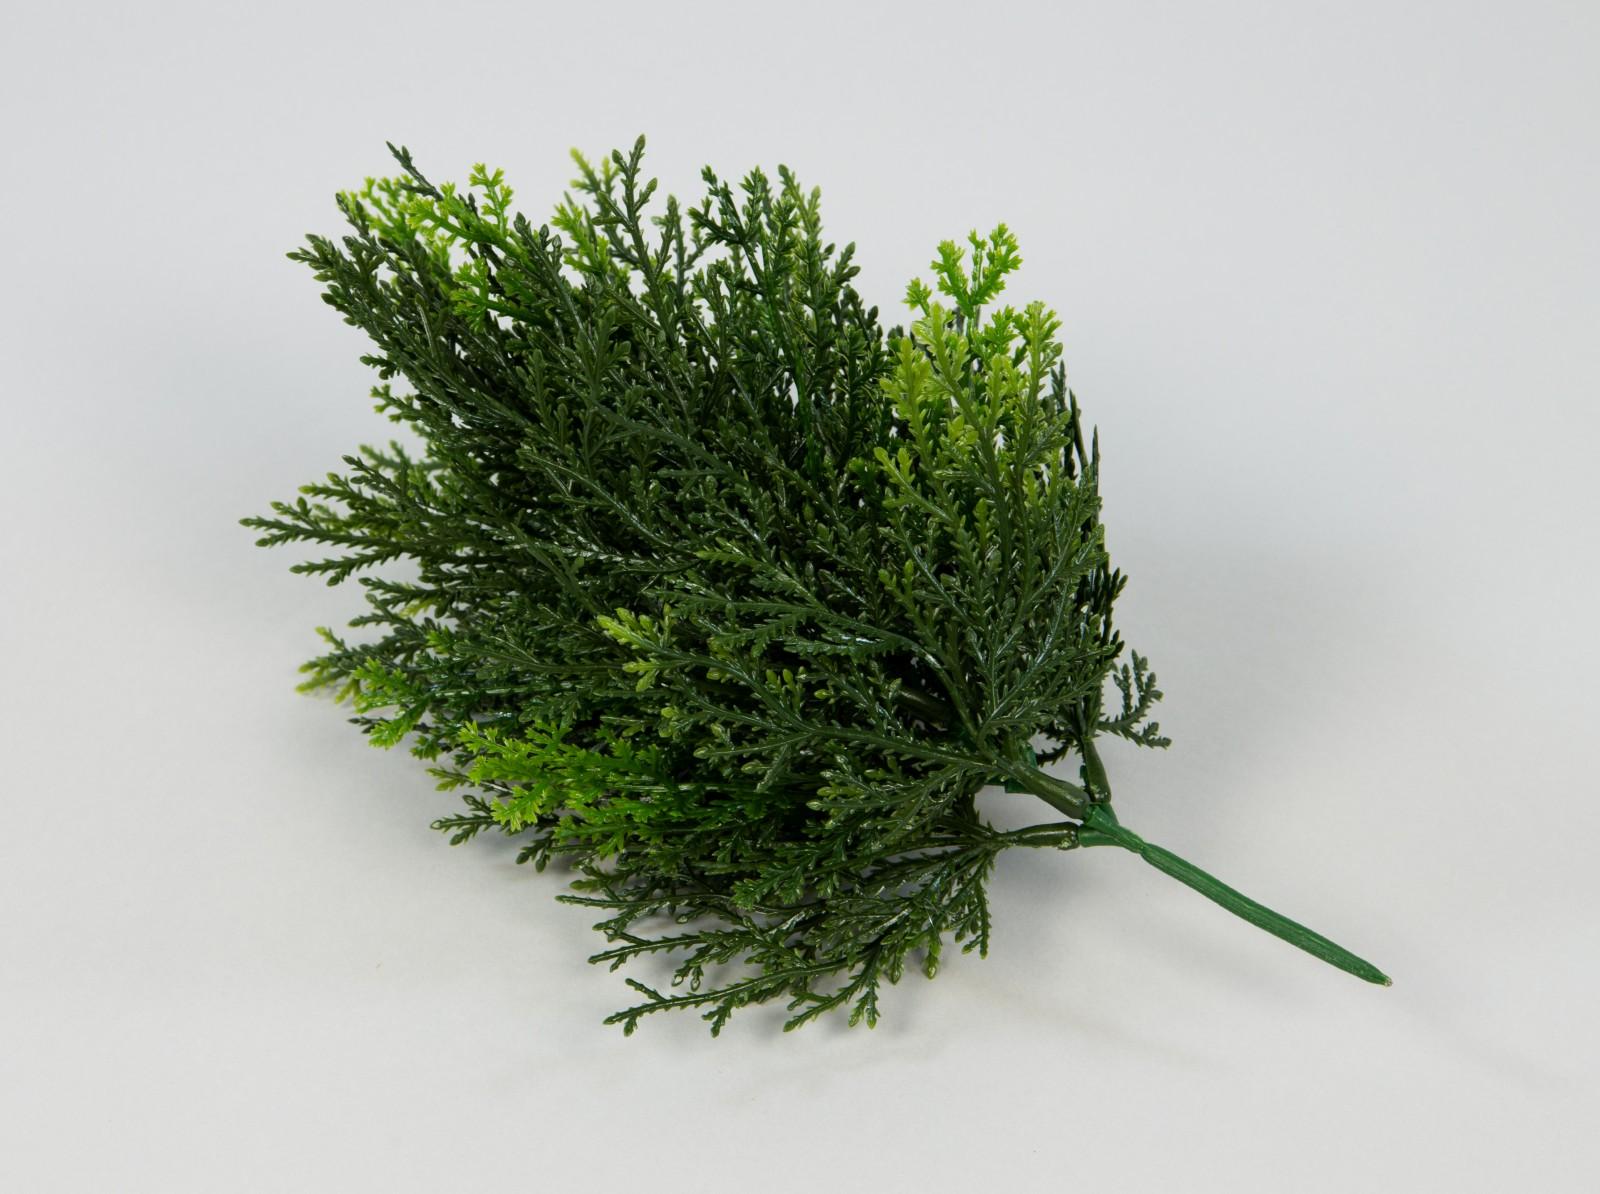 zedernbusch koniferenbusch 24cm gr n la kunstpflanze k nstliche zeder konifere 4251341706199. Black Bedroom Furniture Sets. Home Design Ideas